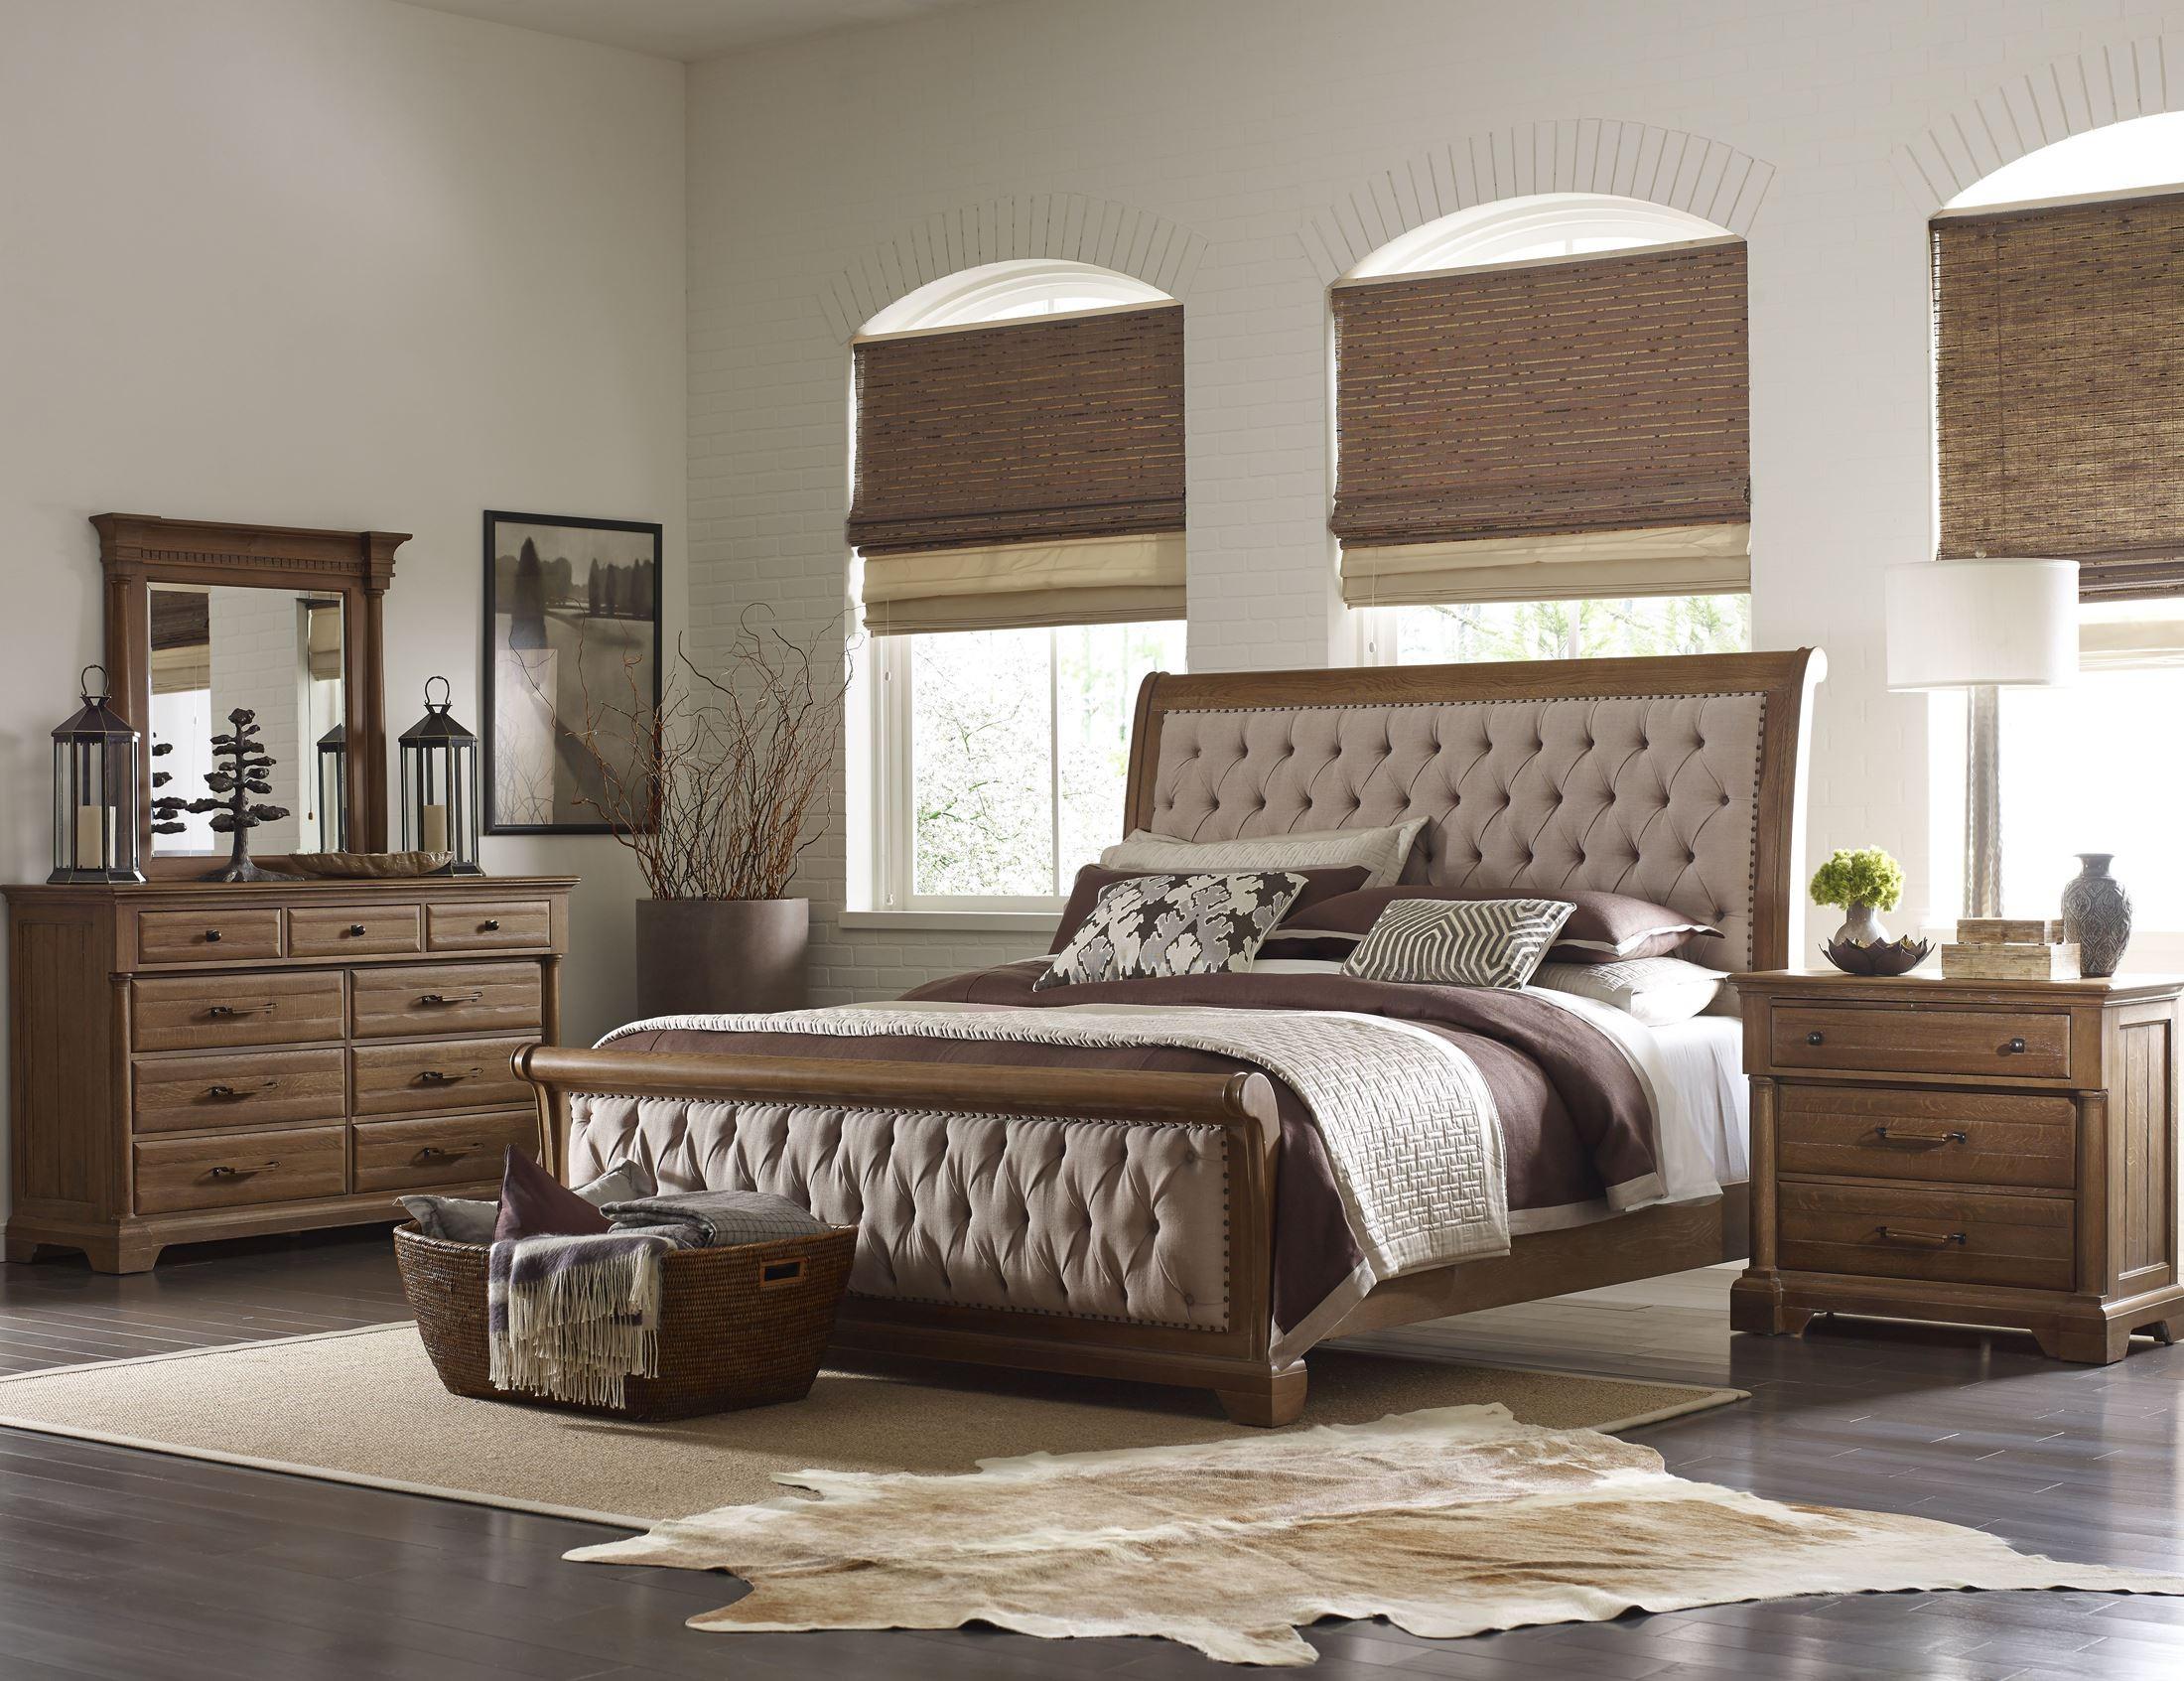 Stone ridge sleigh bedroom set from kincaid 72 150p - Kincaid bedroom furniture for sale ...